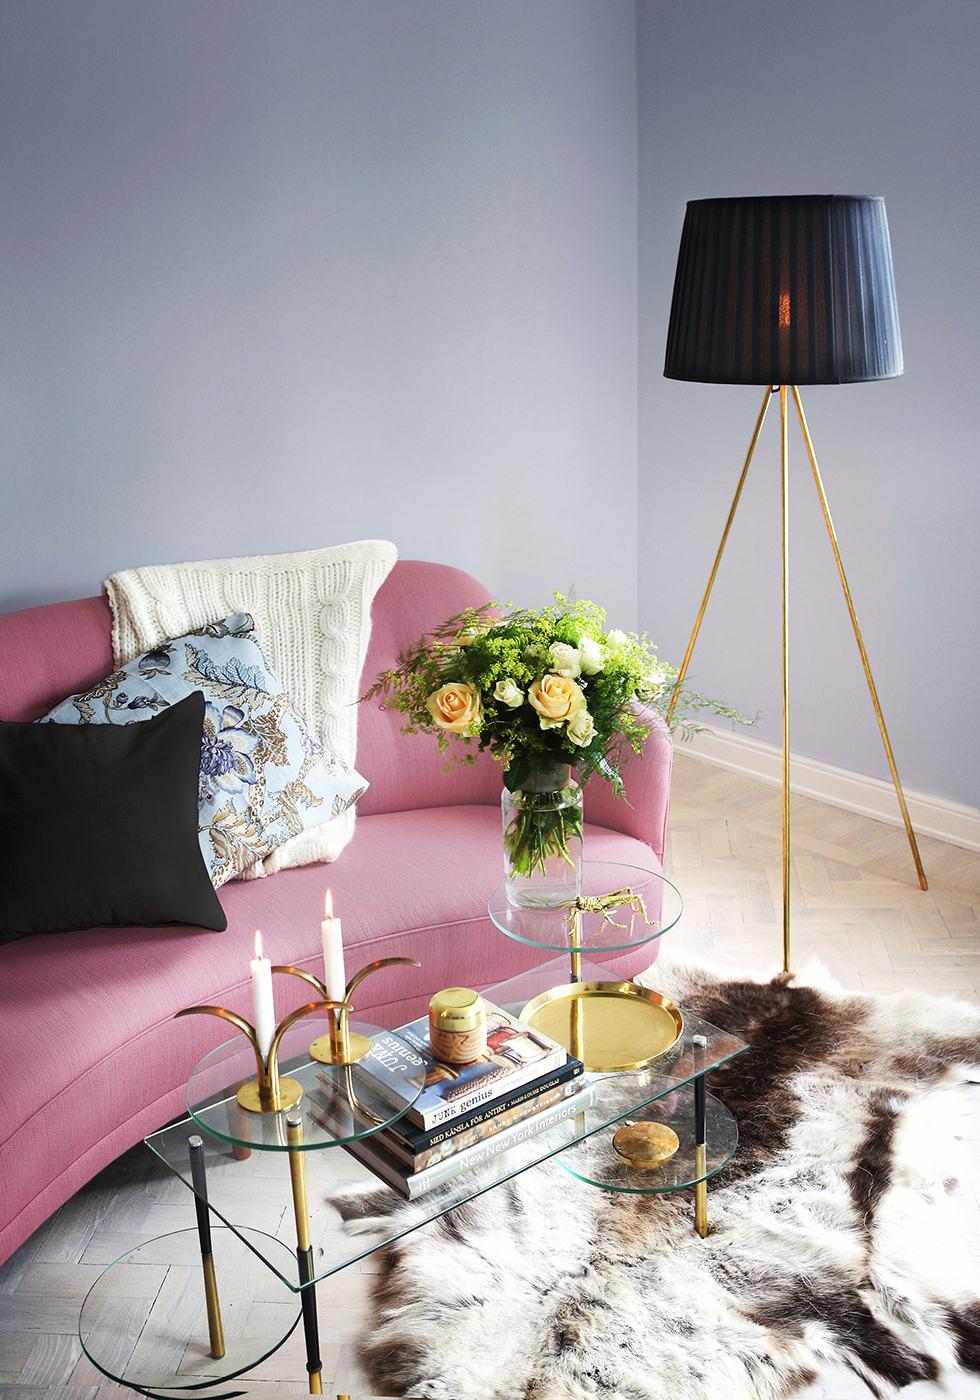 1.-monica-karlstein-golvlampa-massing-lamp-brass-diy-hemmafix.7